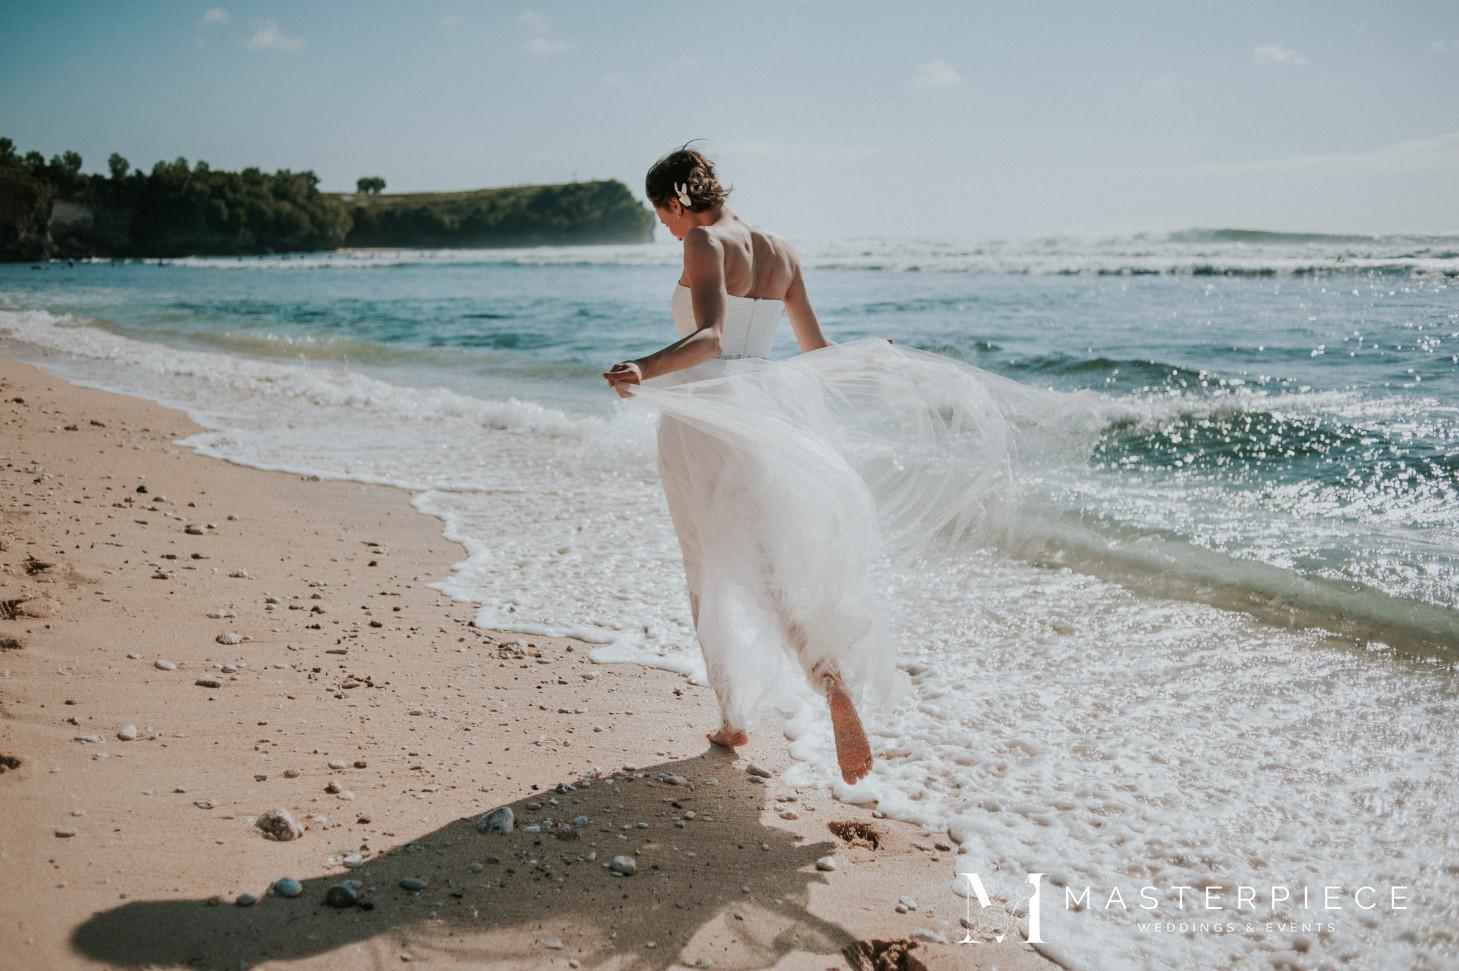 Masterpiece_Weddings_sluby_035